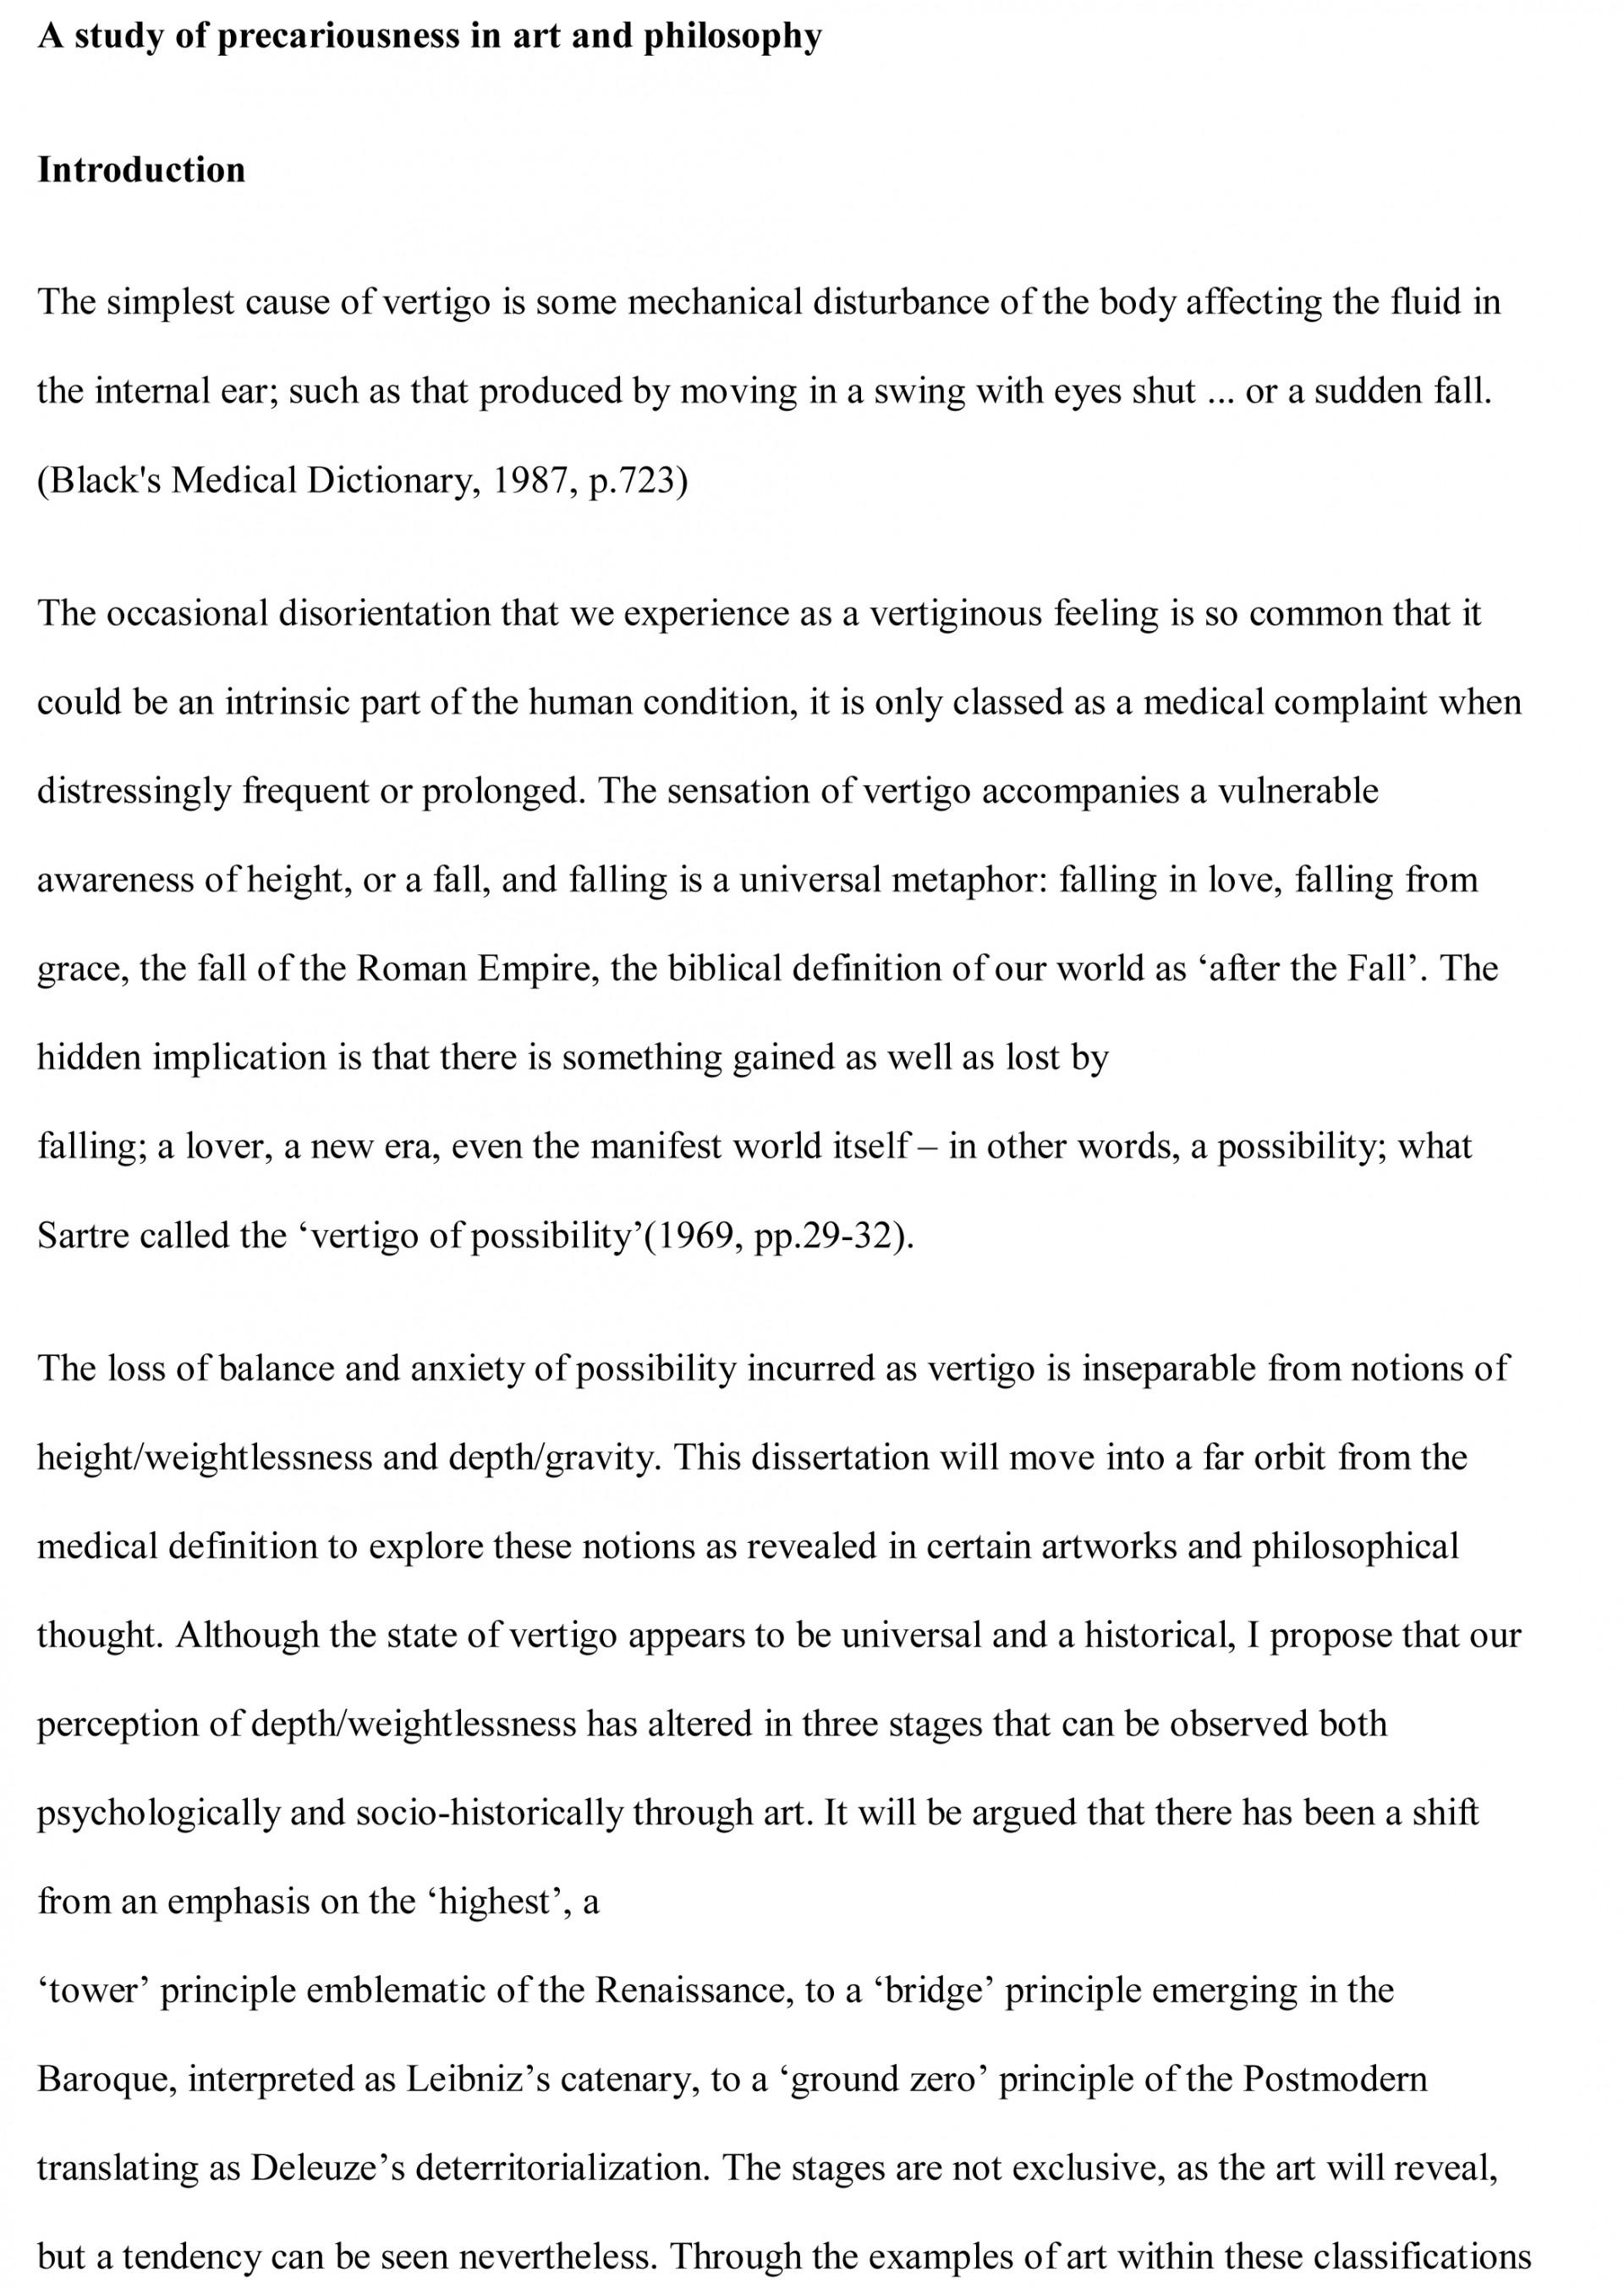 017 Essay Example Sample Act Essays Art Coursework Wonderful New Writing 1920